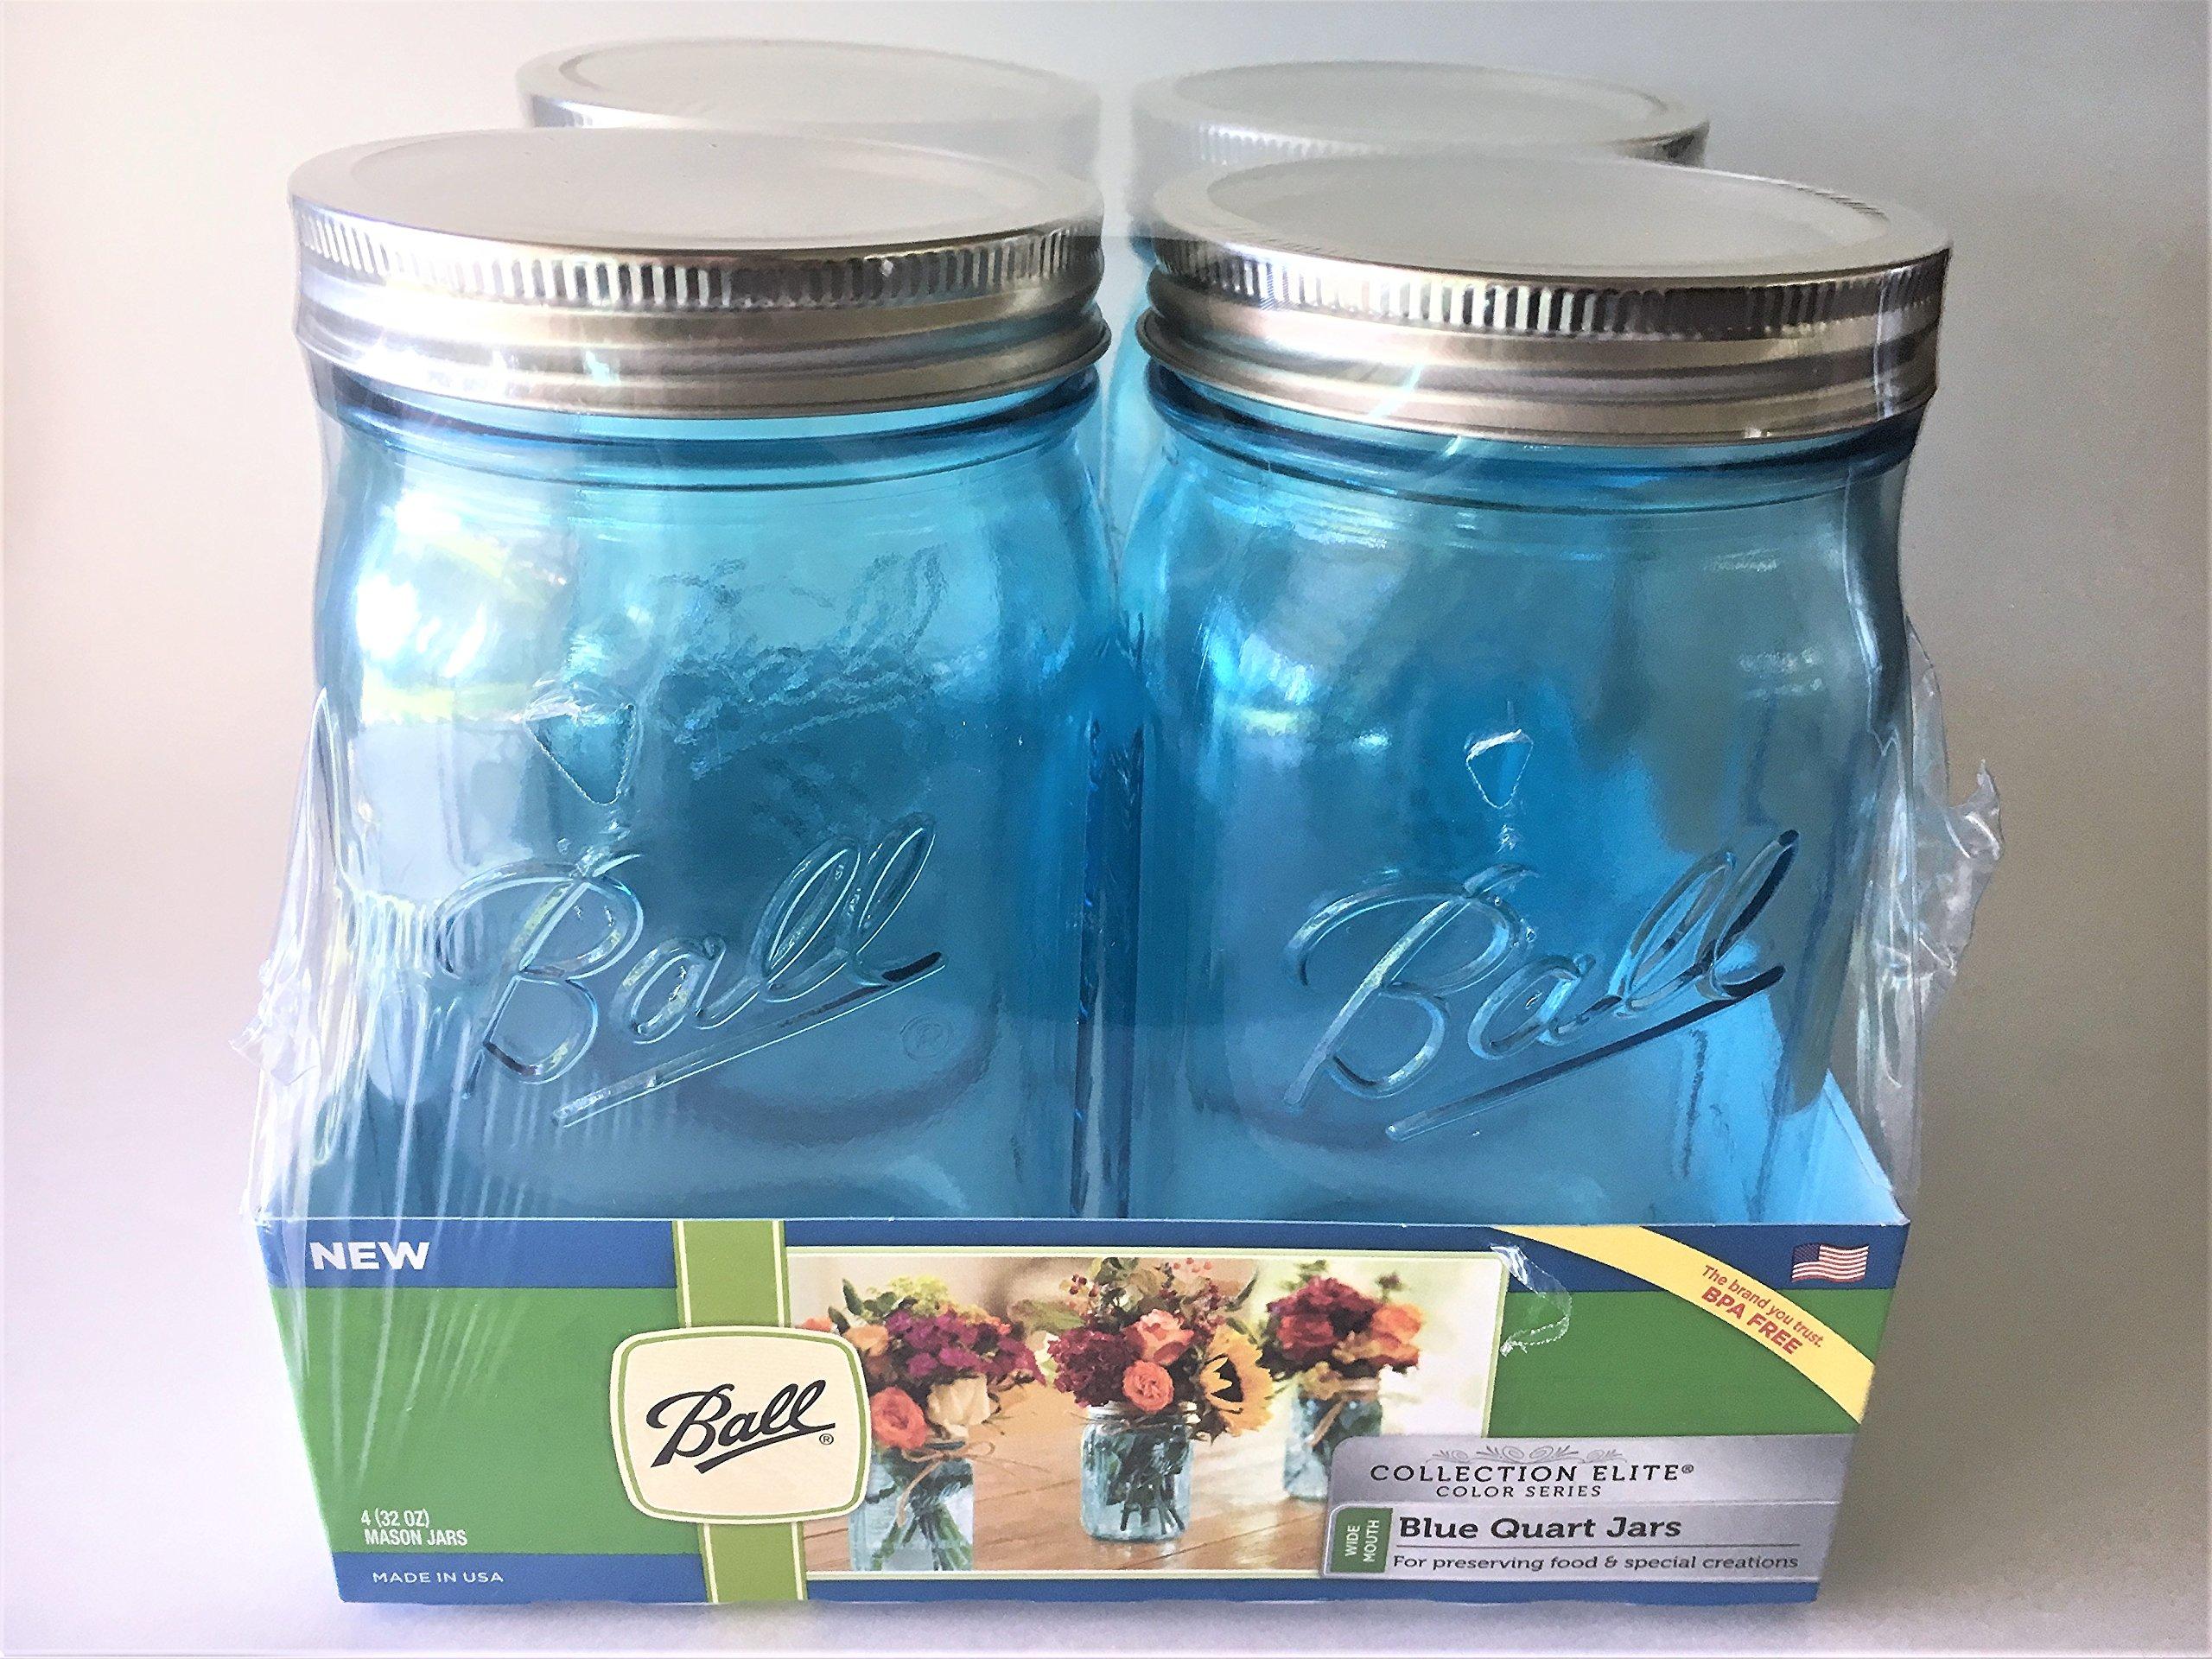 Ball Mason Jar-32 oz. Aqua Blue Glass Ball Collection Elite Color Series Wide Mouth-Set of 4 Jars